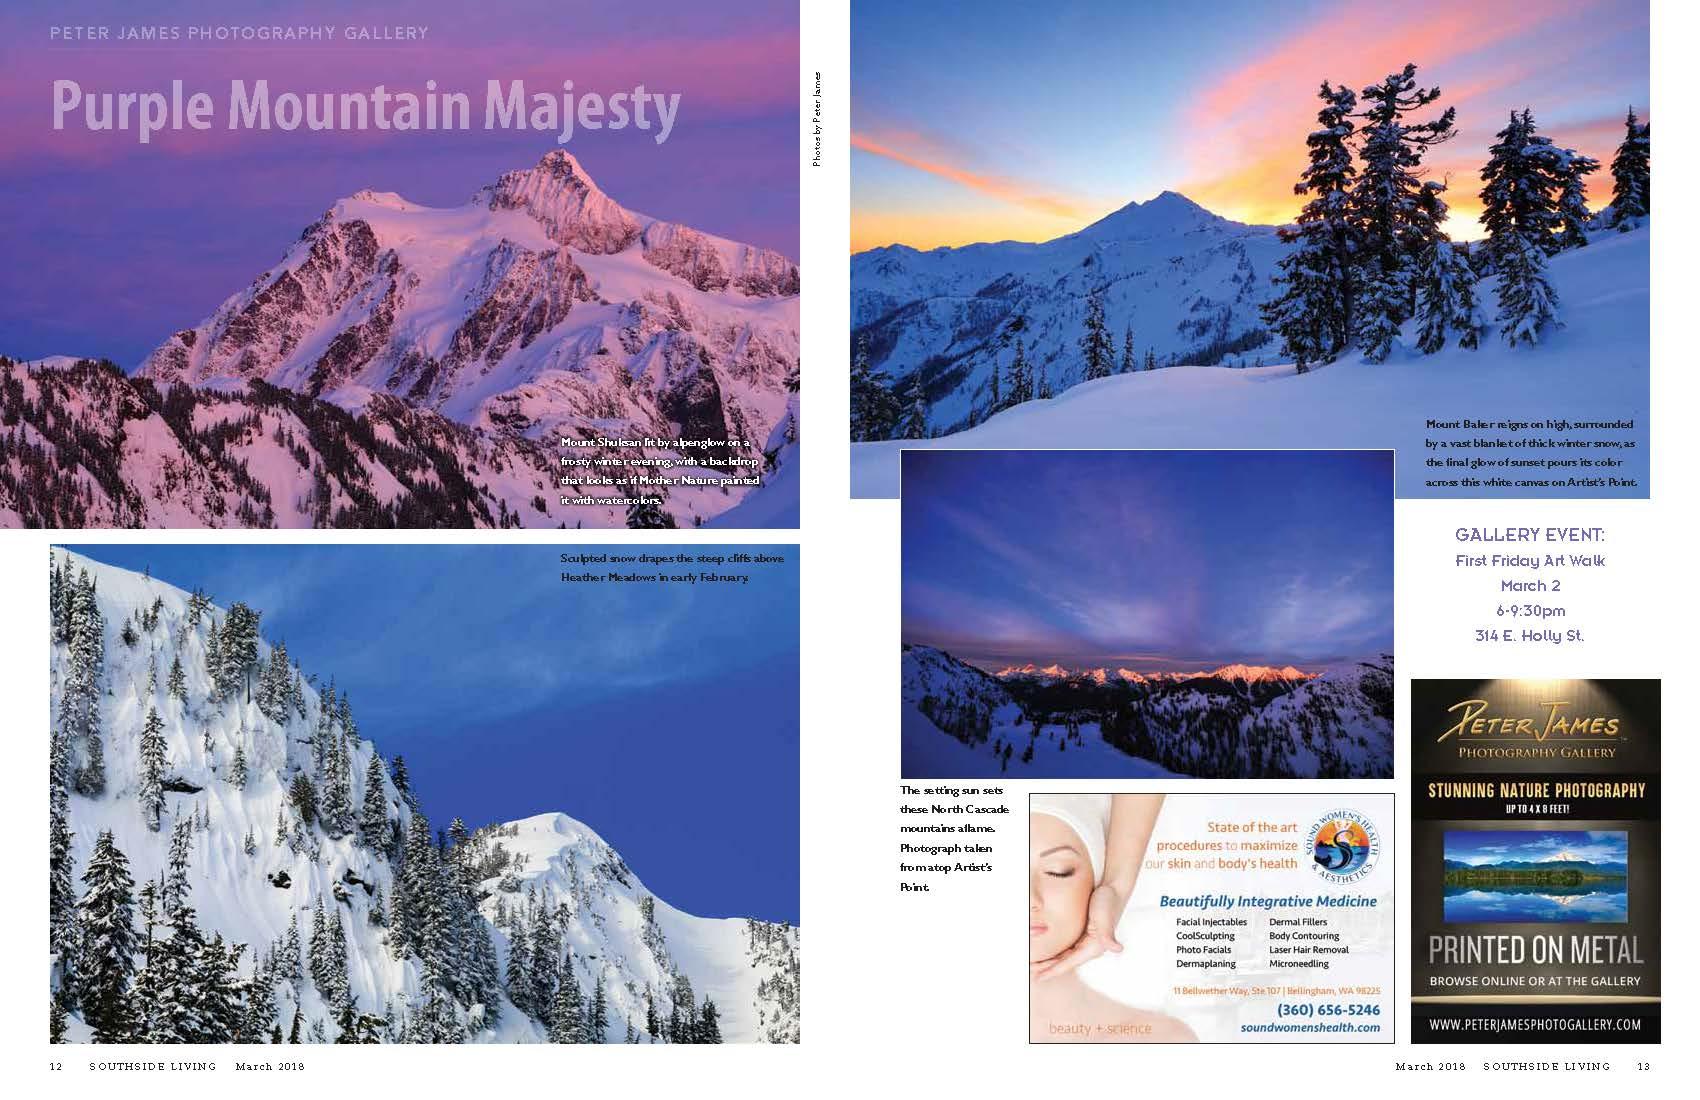 Mount Baker at Sunset